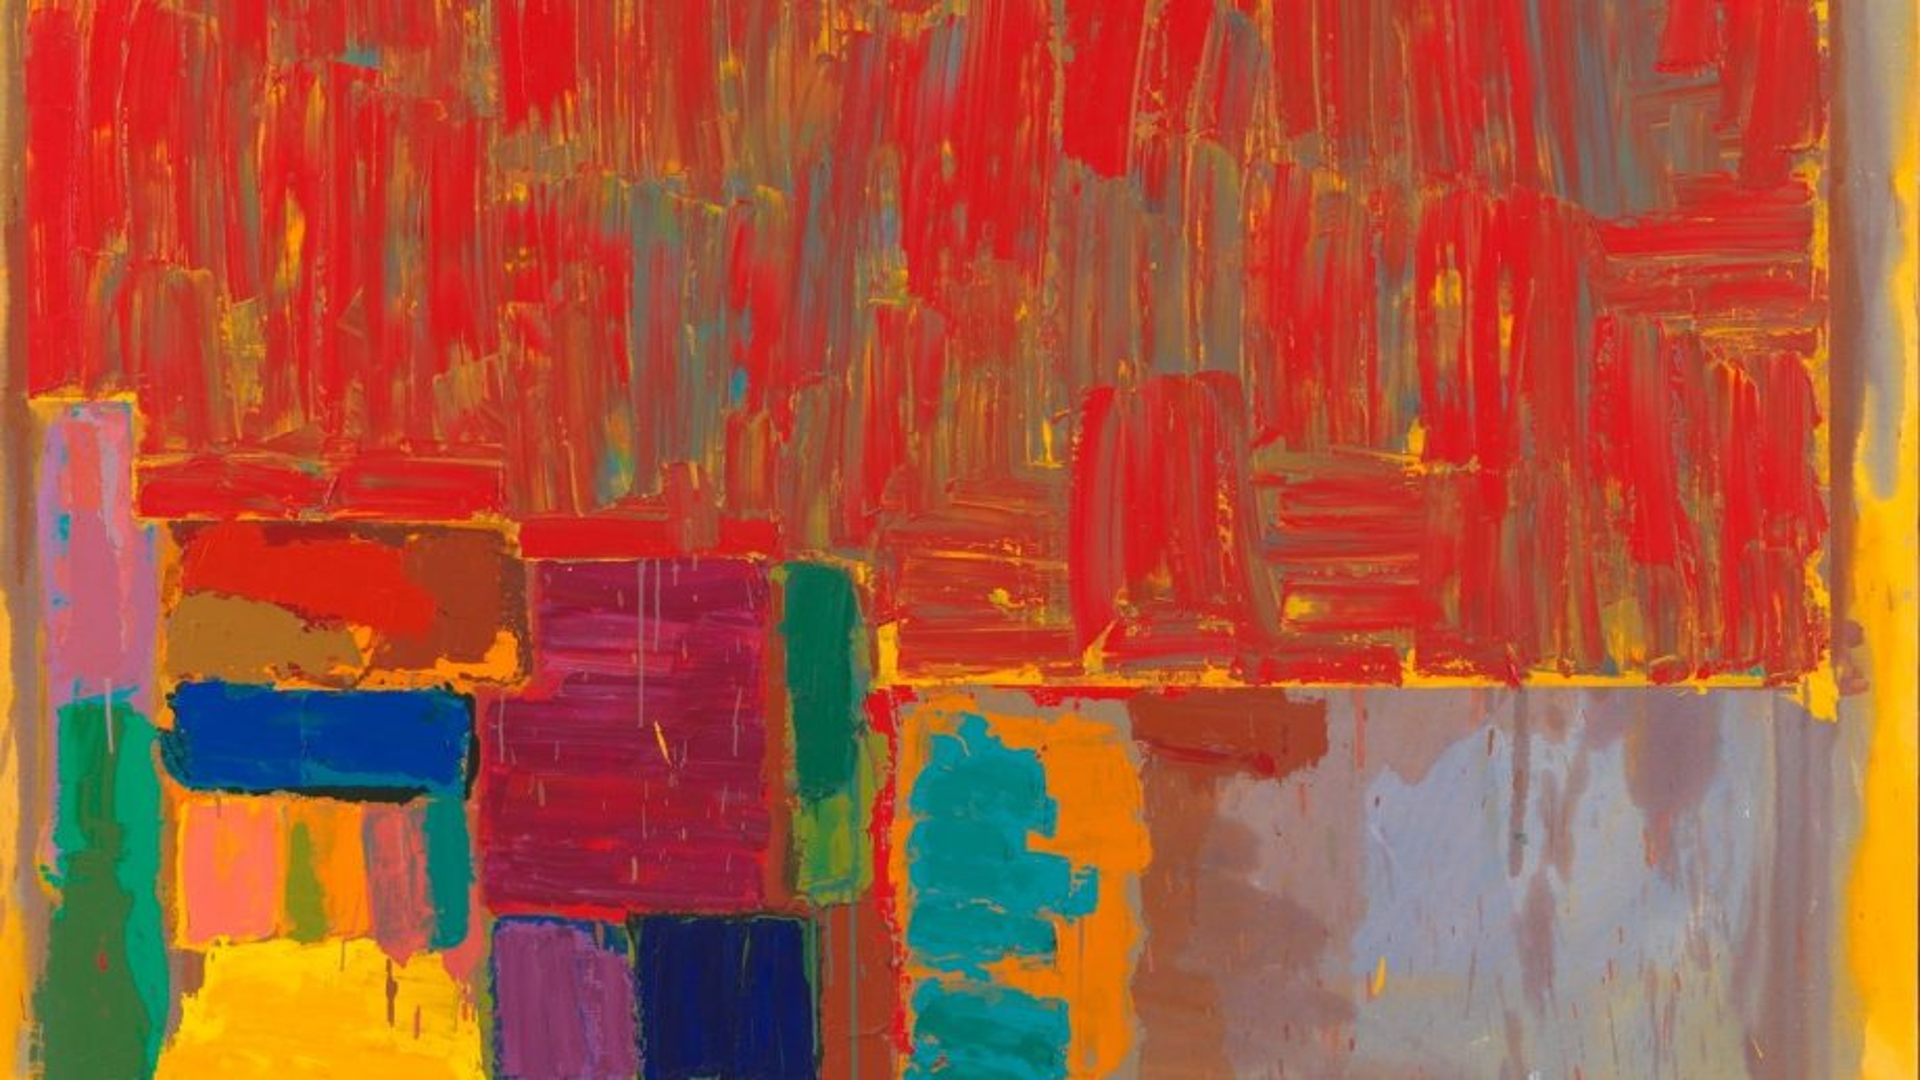 Tate Britain features John Hoyland in 'Spotlight' series